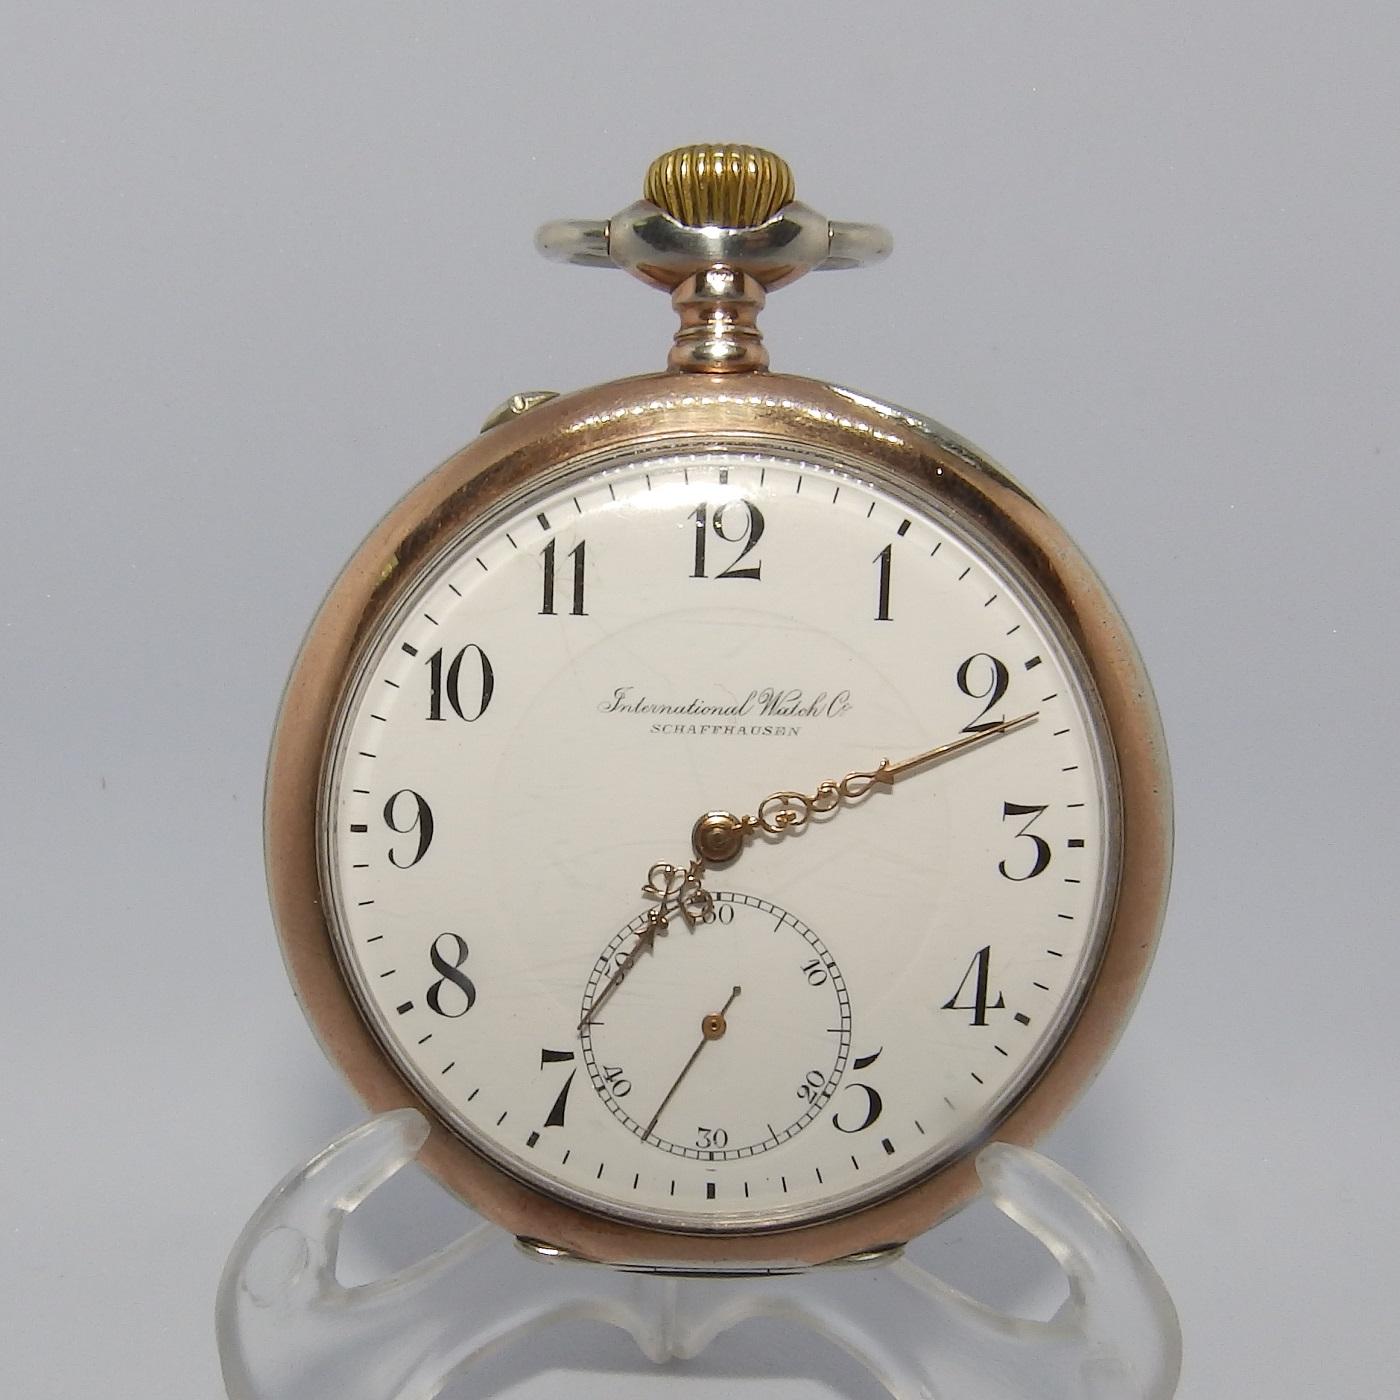 IWC (International Watch Company). Reloj de Bolsillo, Lepine y remontoir. Suiza, año 1917.